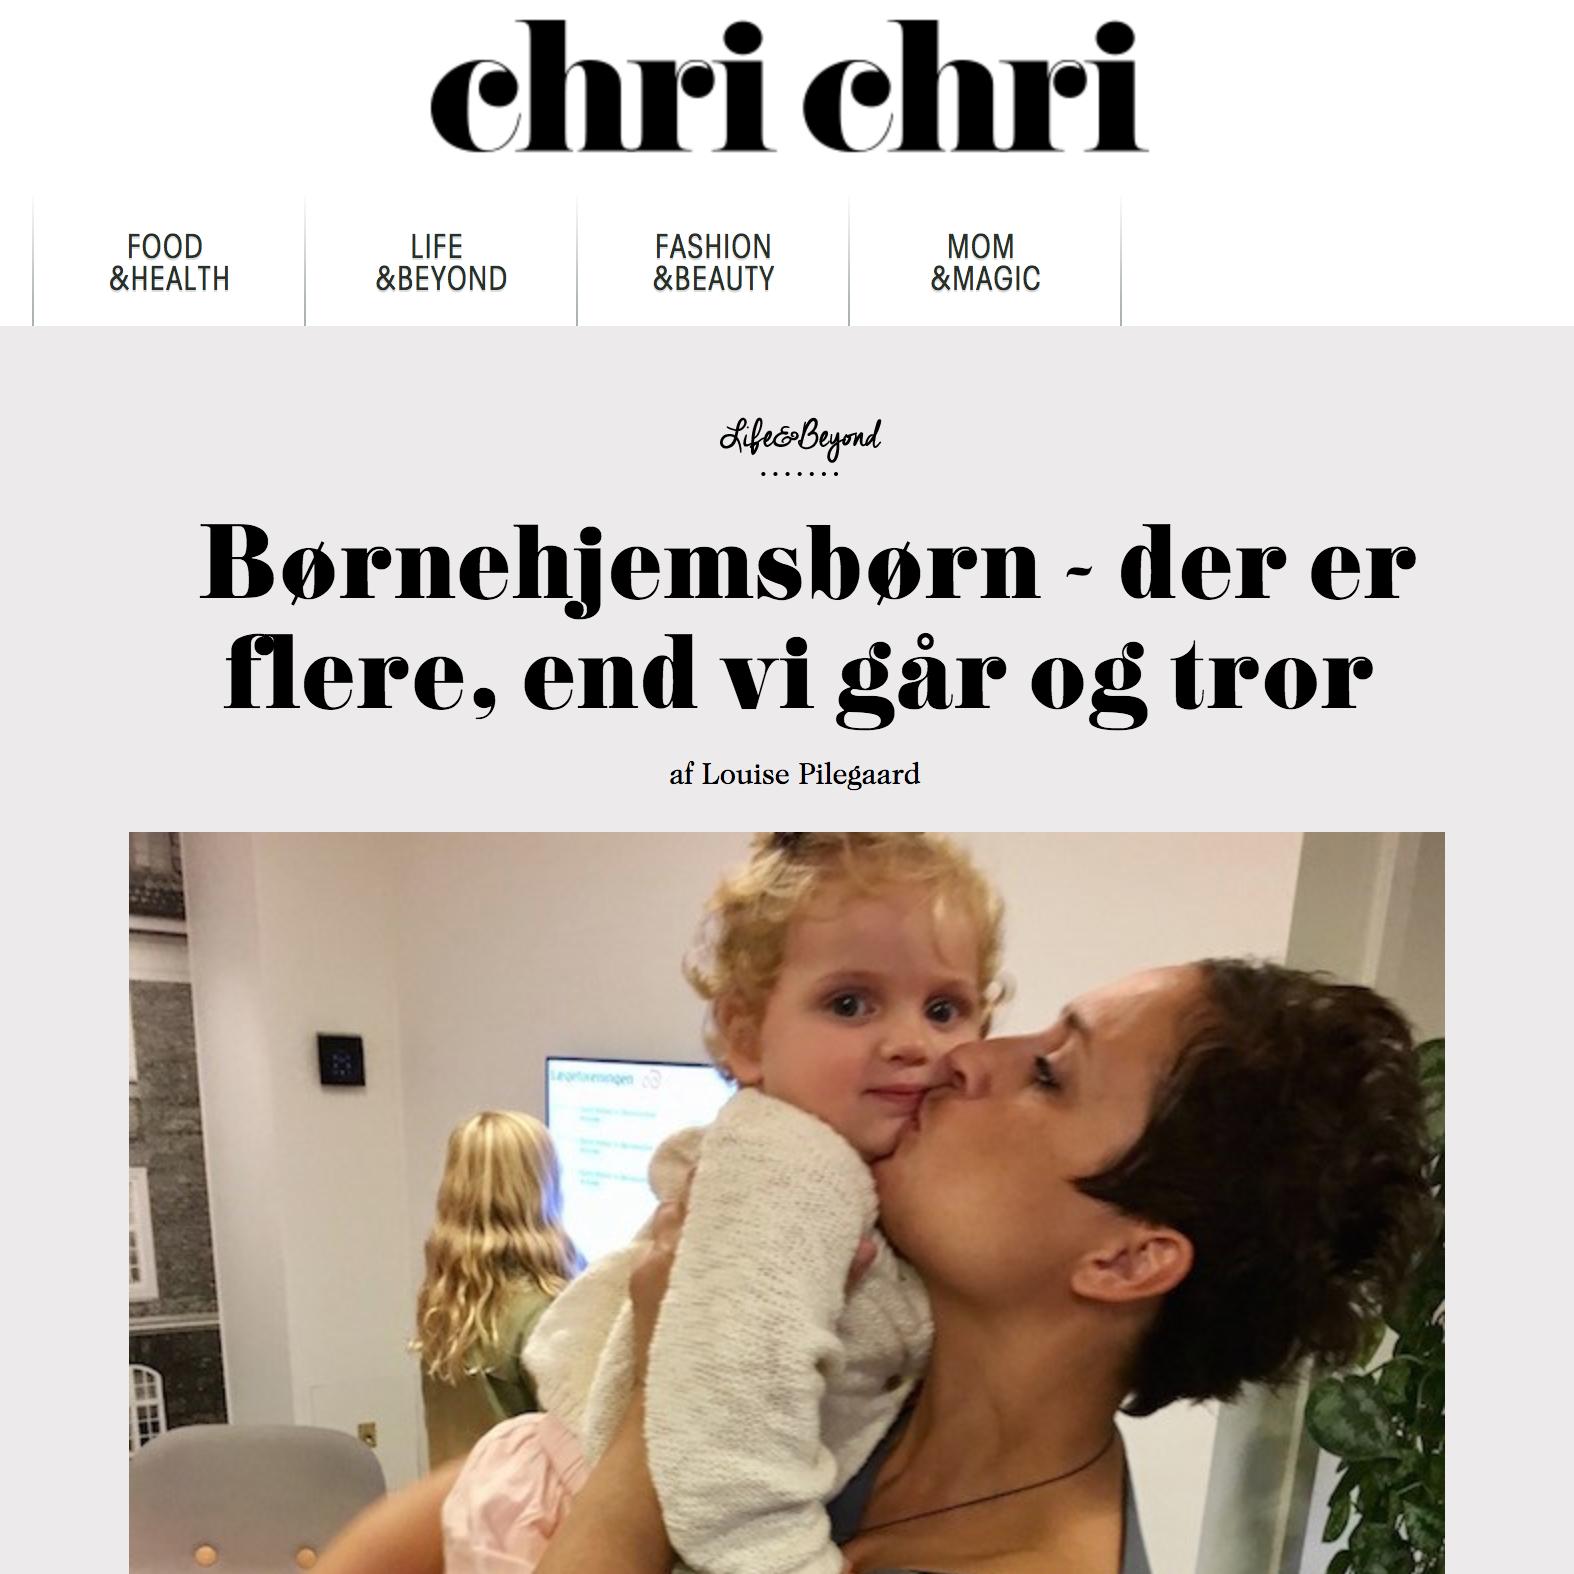 Chri Chri